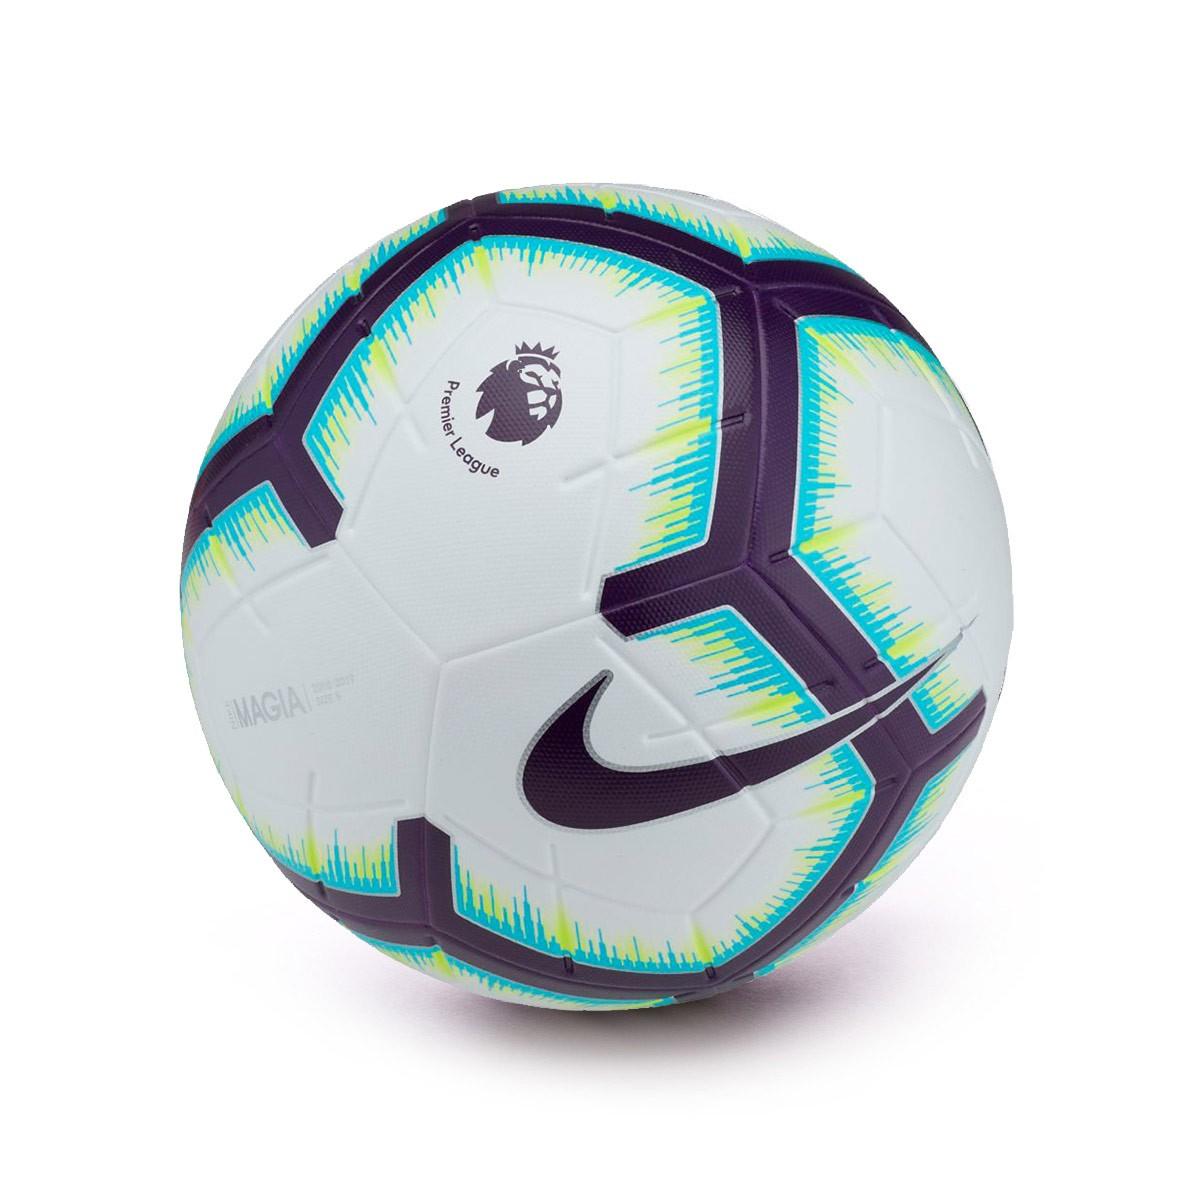 Sports Et Loisirs Nike Magia Ballon De Football Pacsea Ph